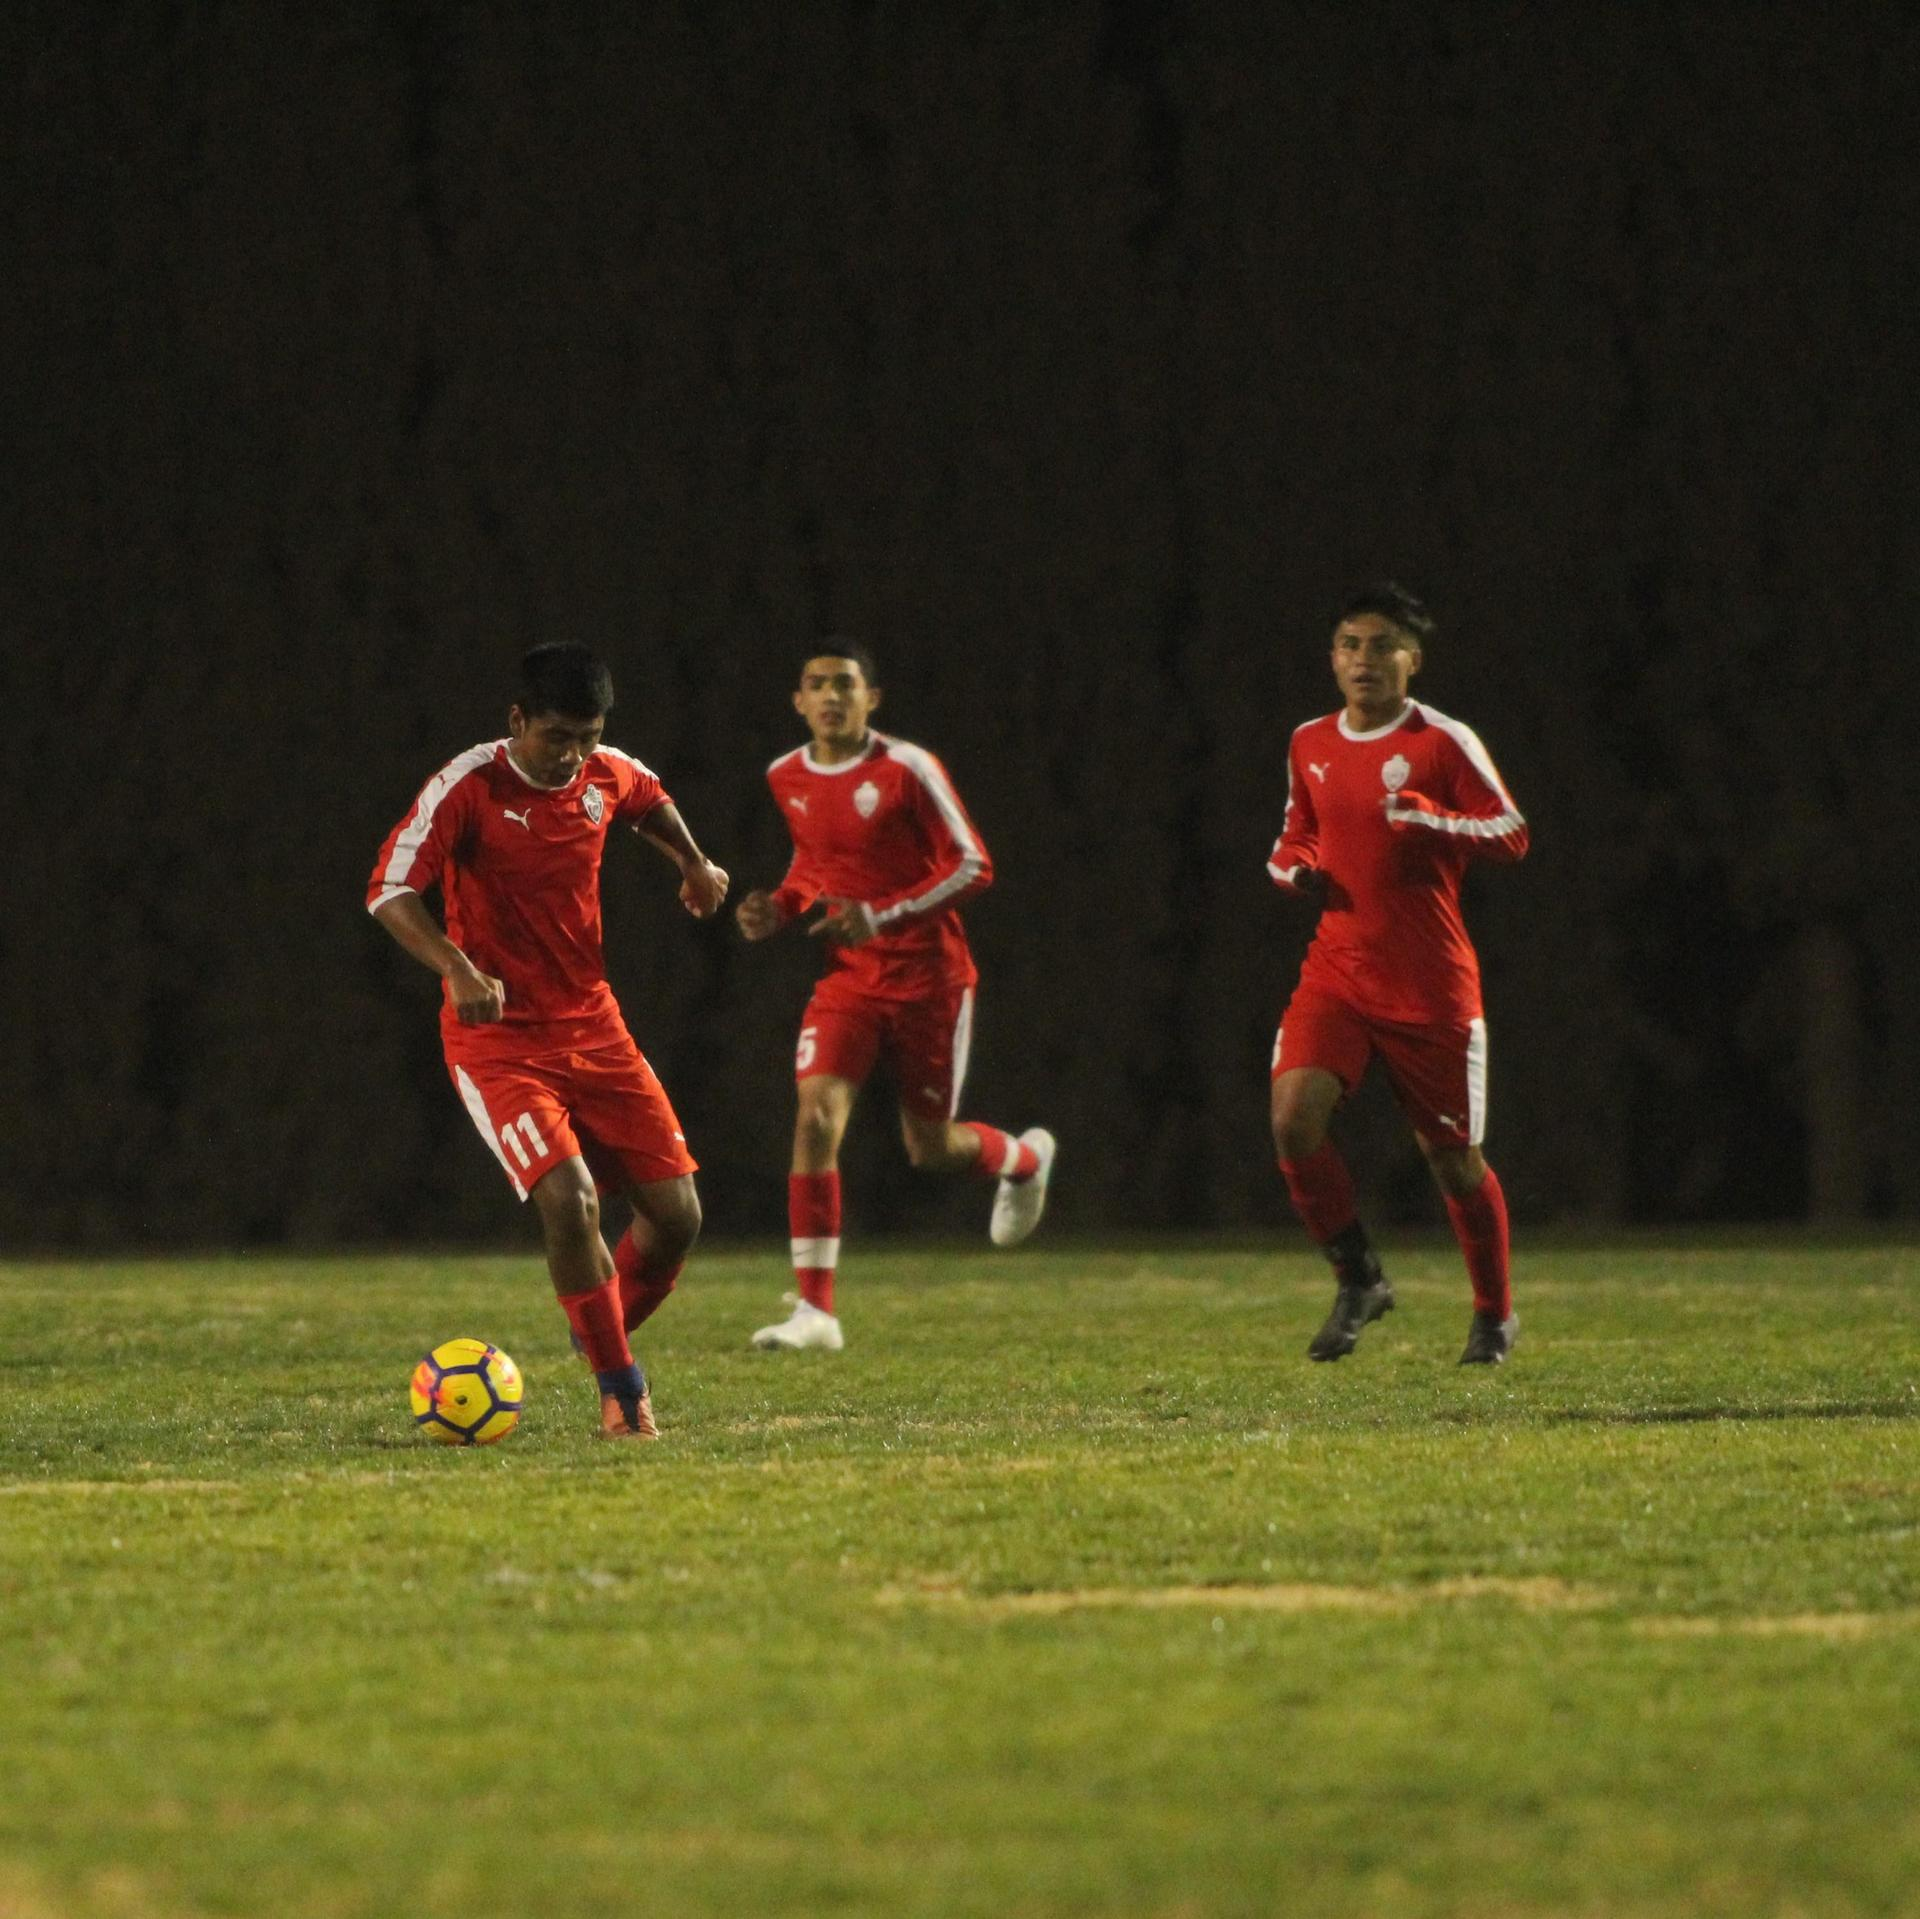 Cristobal Galvan, Edgar Campos and Favian Casillas with the ball